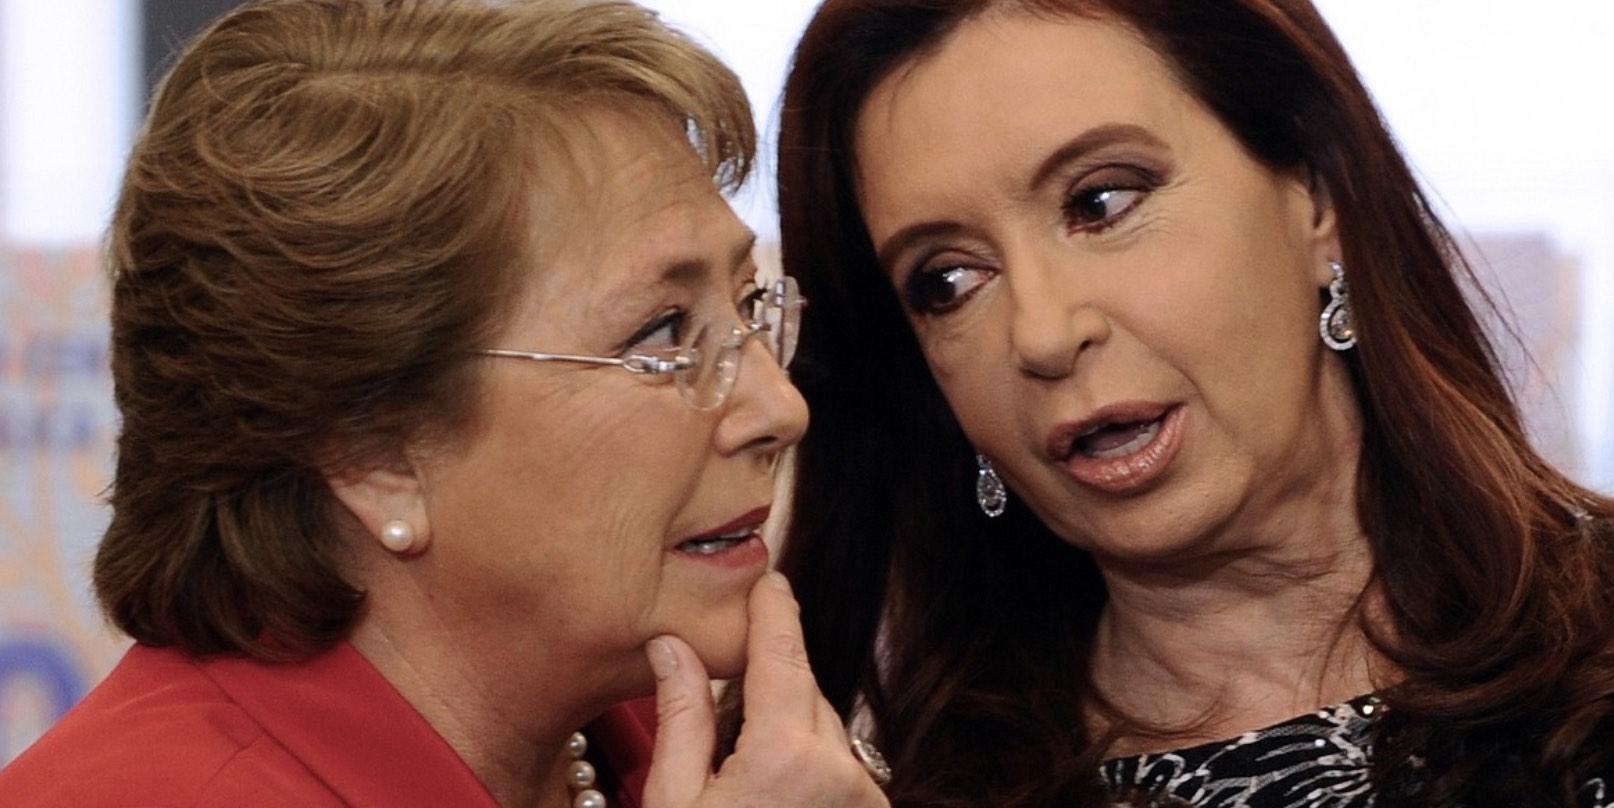 Bachelet y Kirchner, Populismo de izquierda